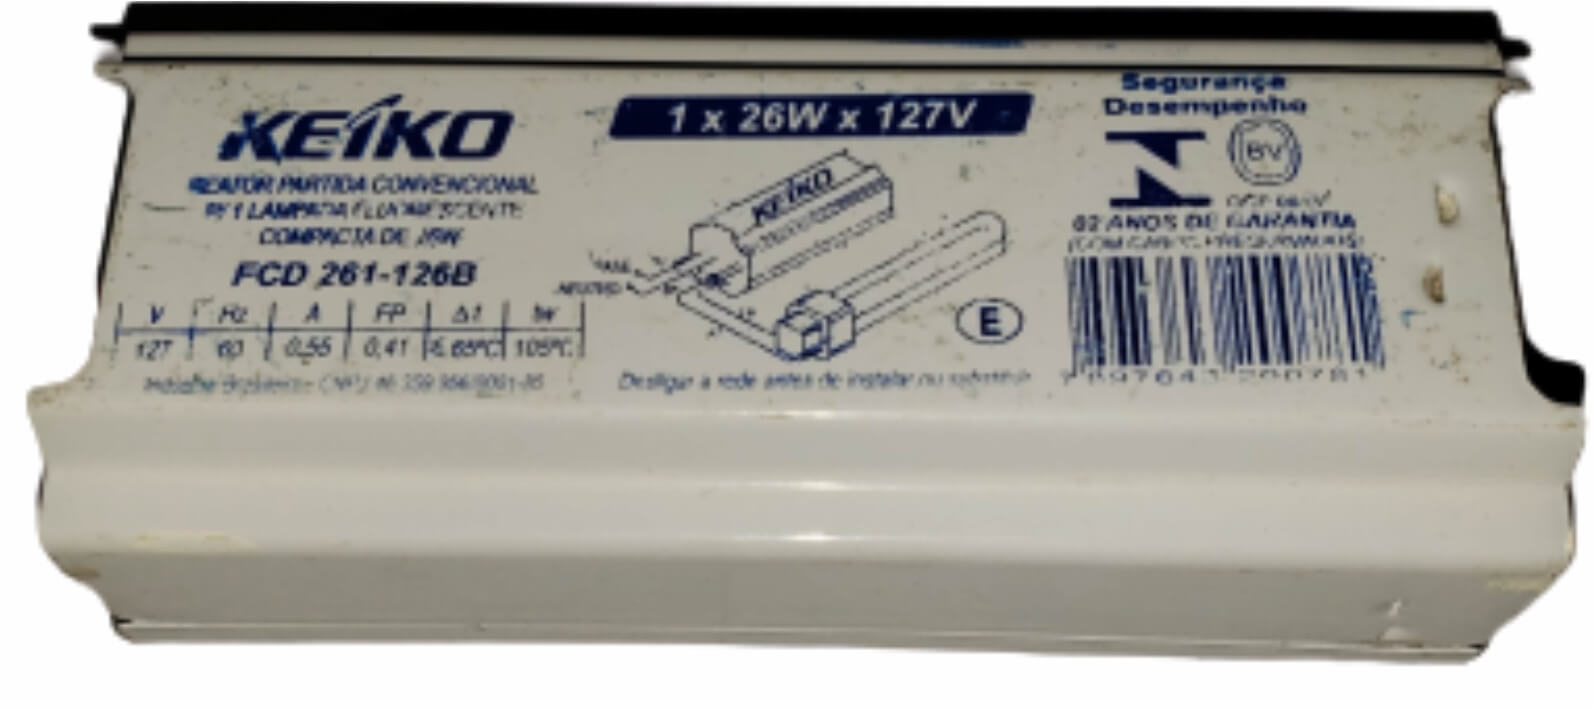 Reator Eletromagnético 1x26x127v - KEIKO